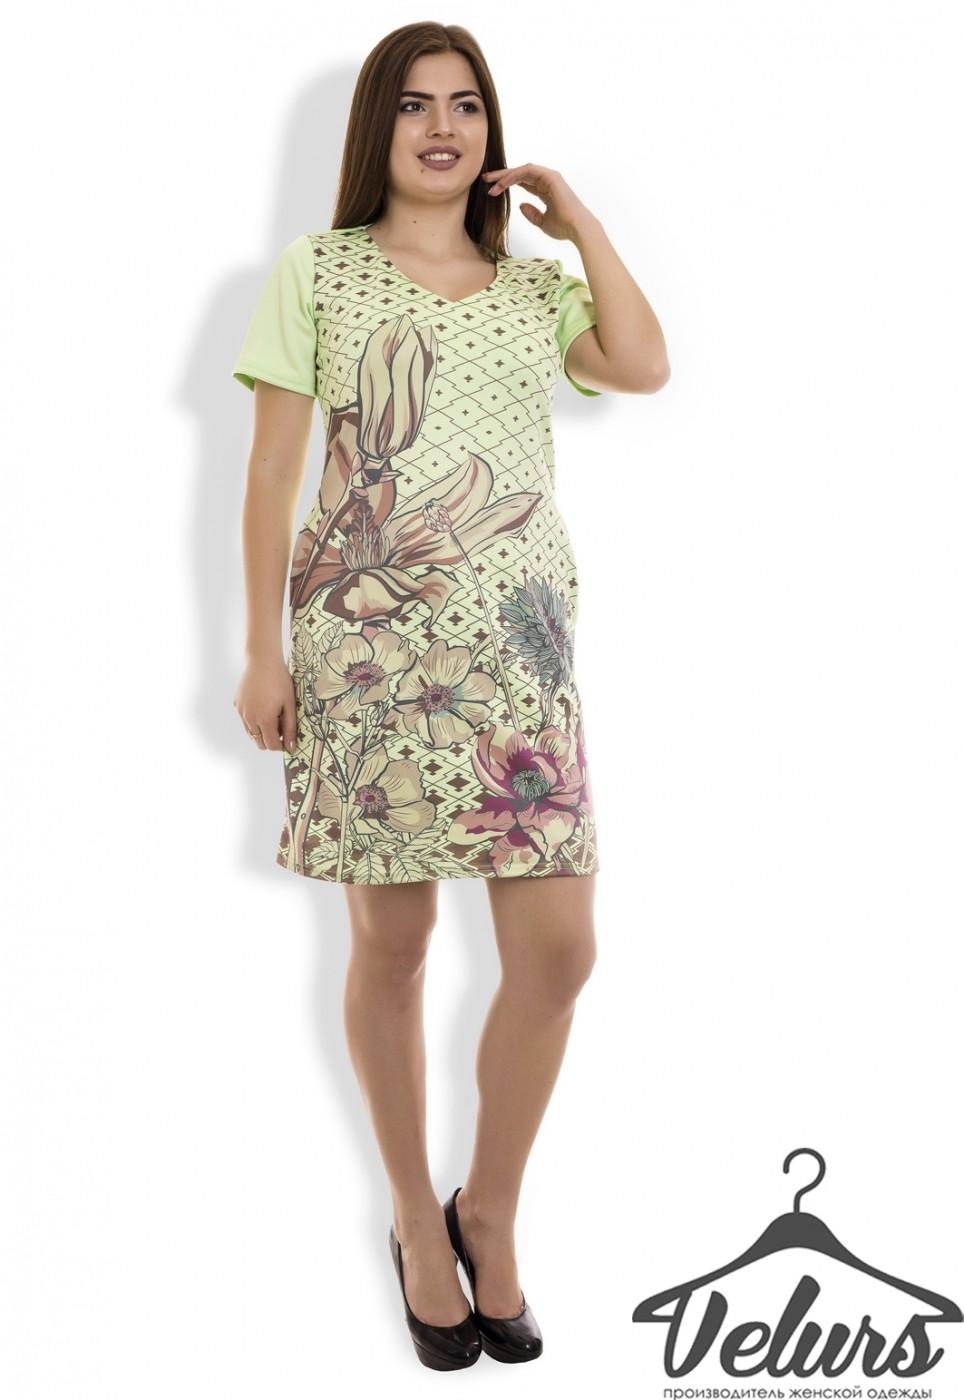 Velurs: Платье 212110 - фото 25